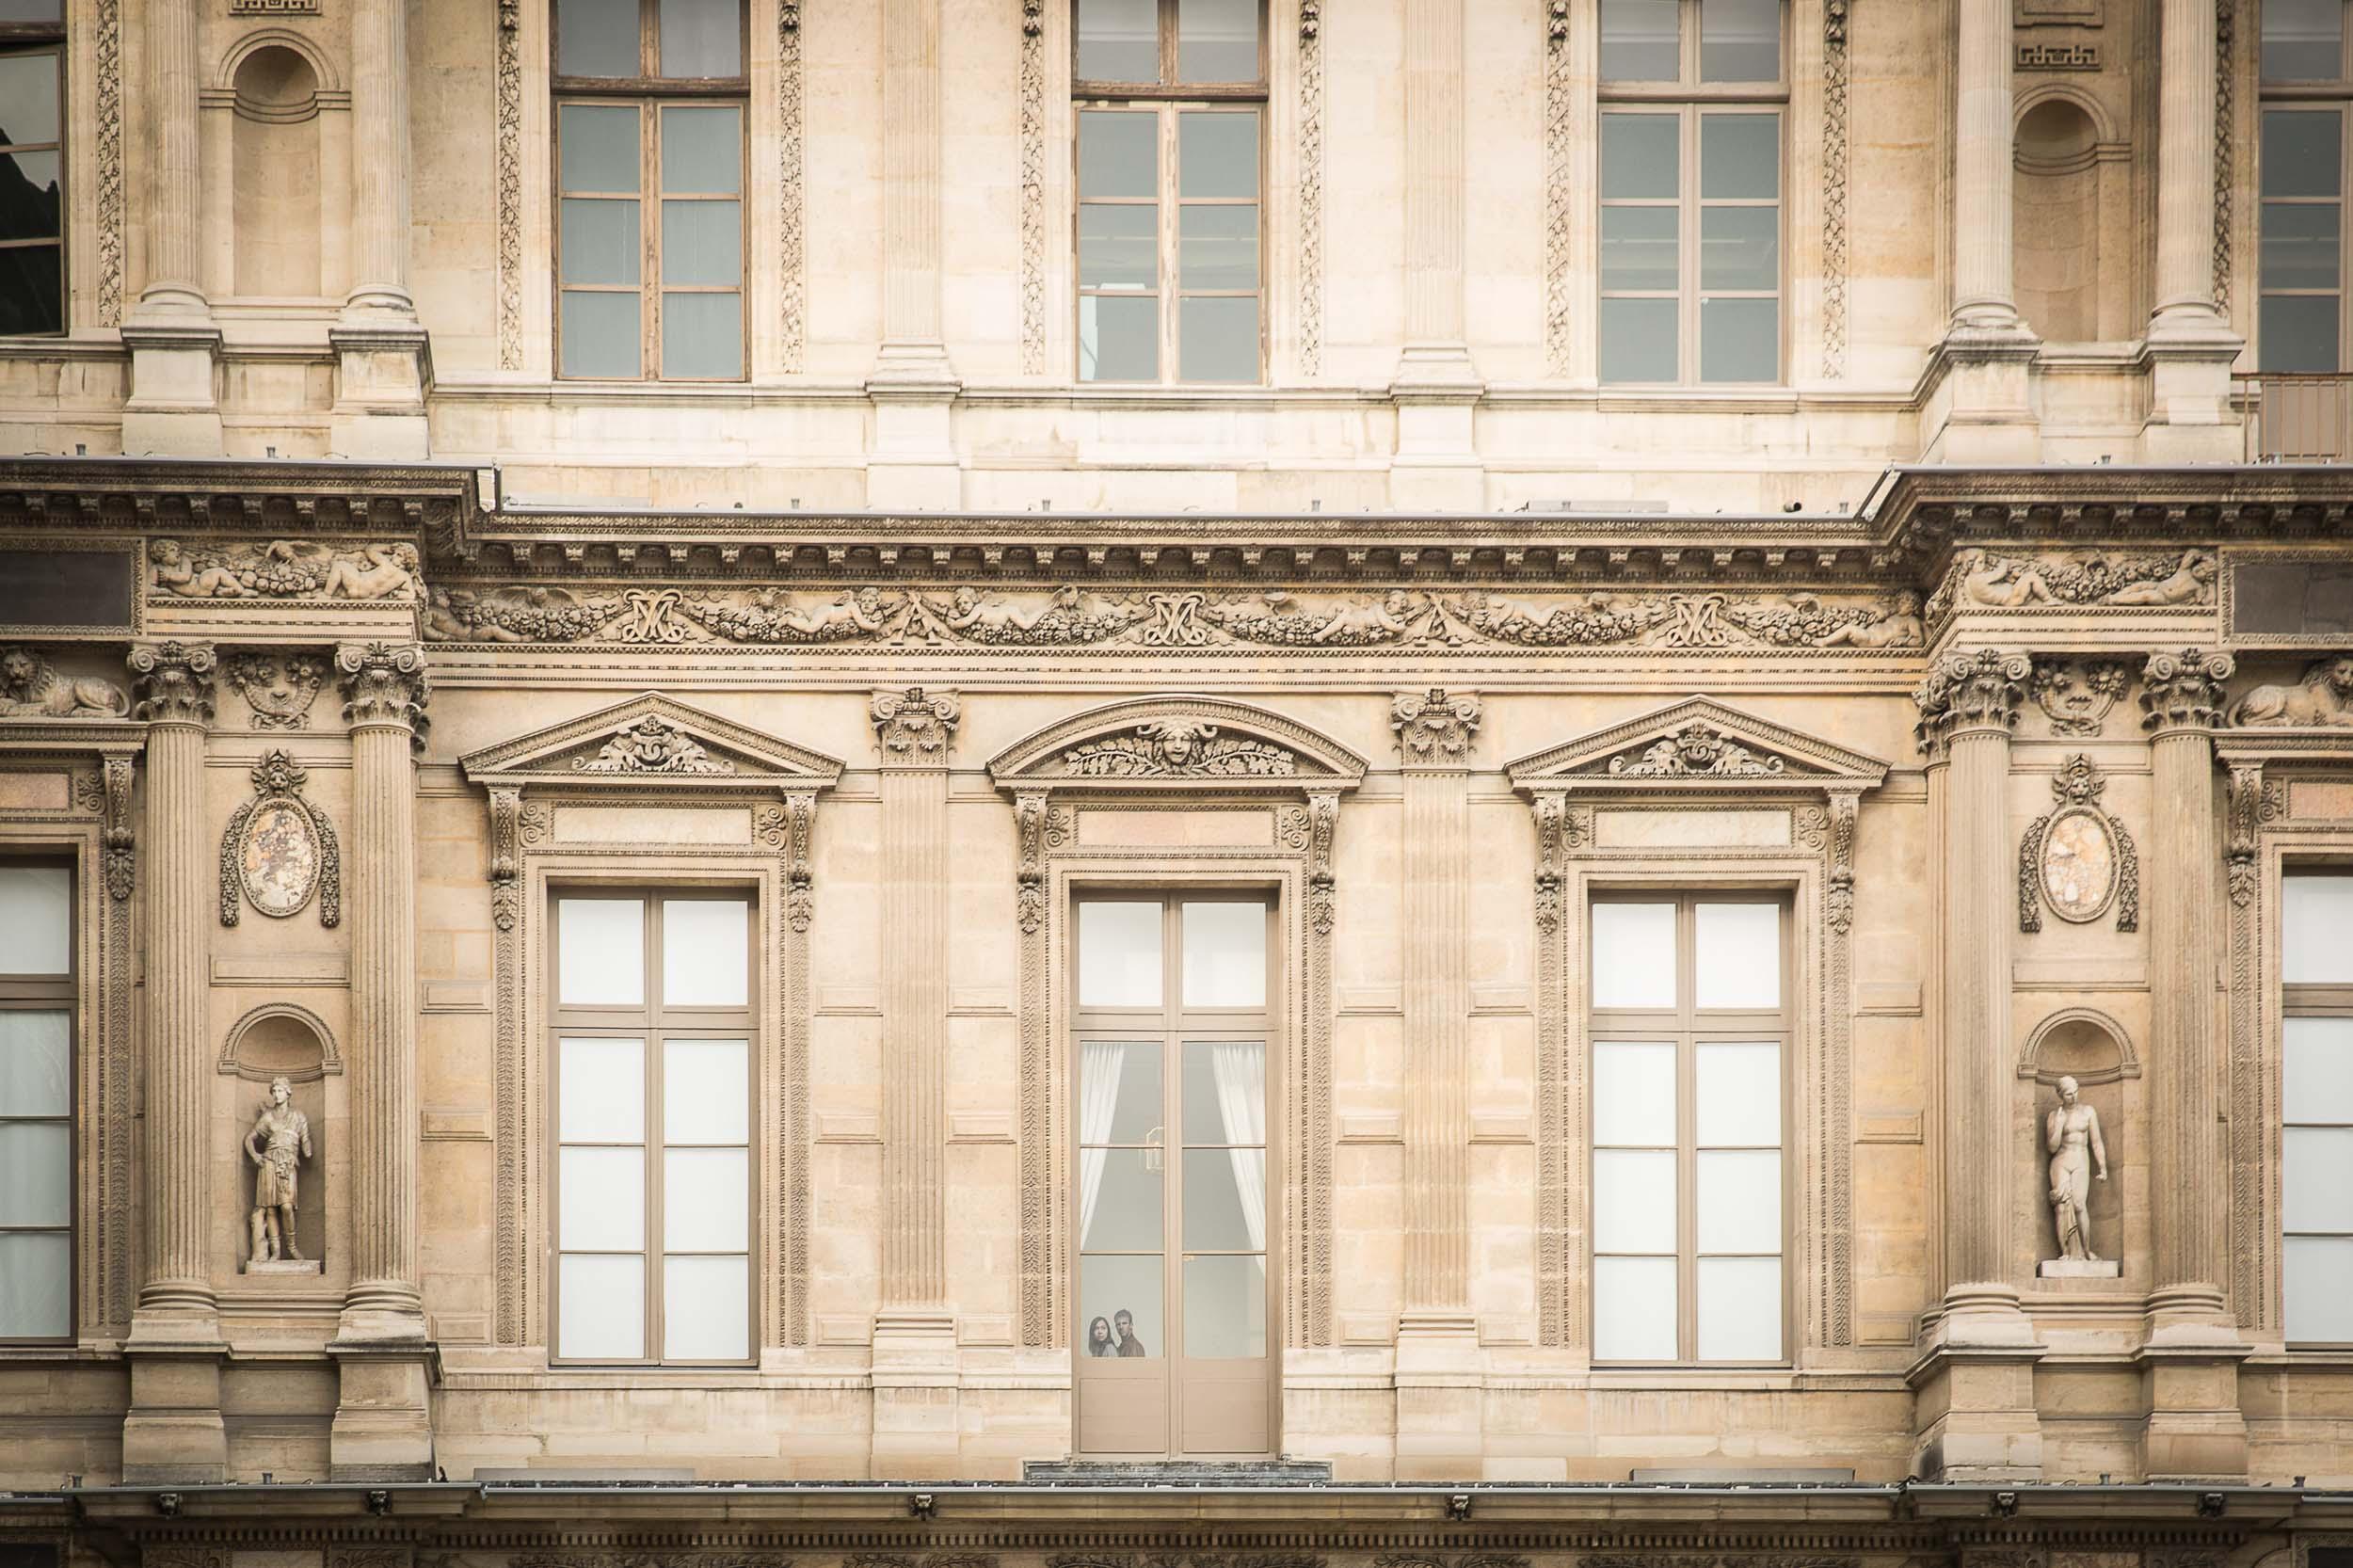 Paris-Louvre-couple-looking-from-window.jpg